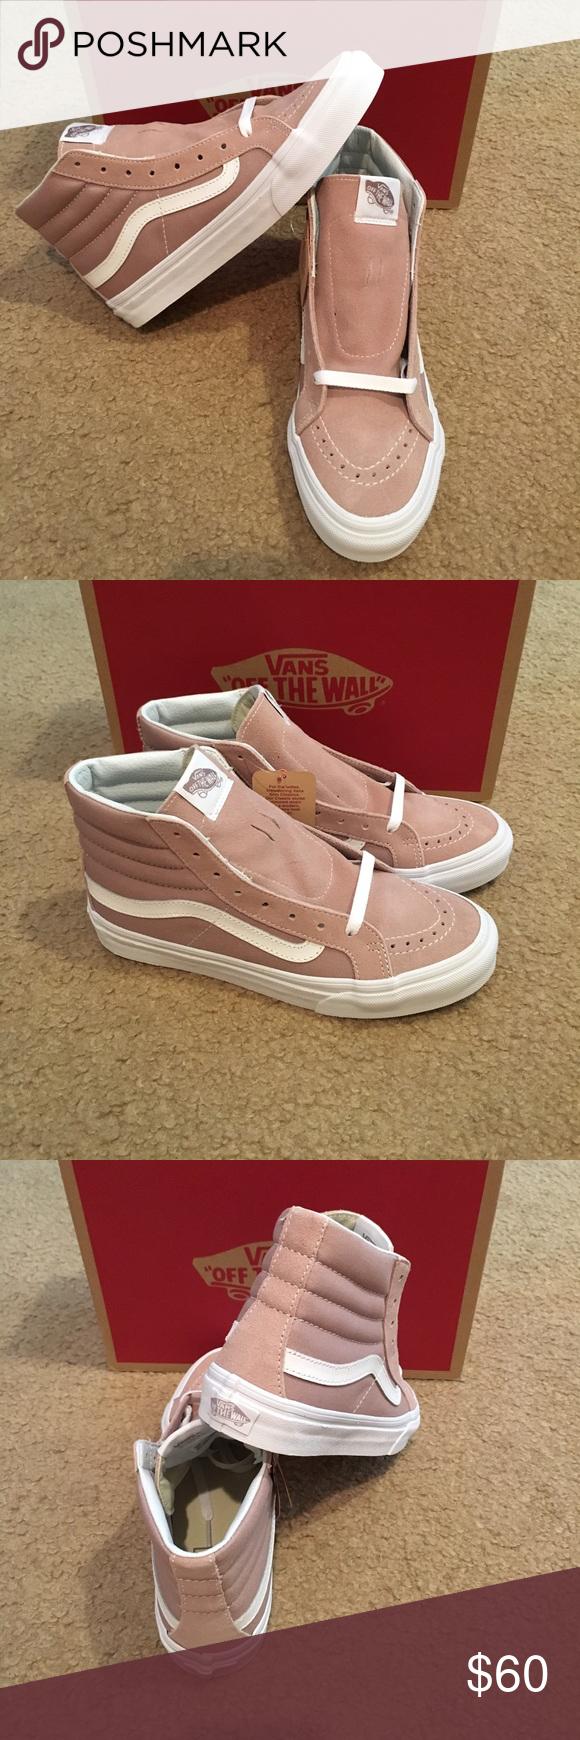 c443b18b44 Suede Canvas SK8Hi Slim Vans New in box. Fawn True white Vans Shoes